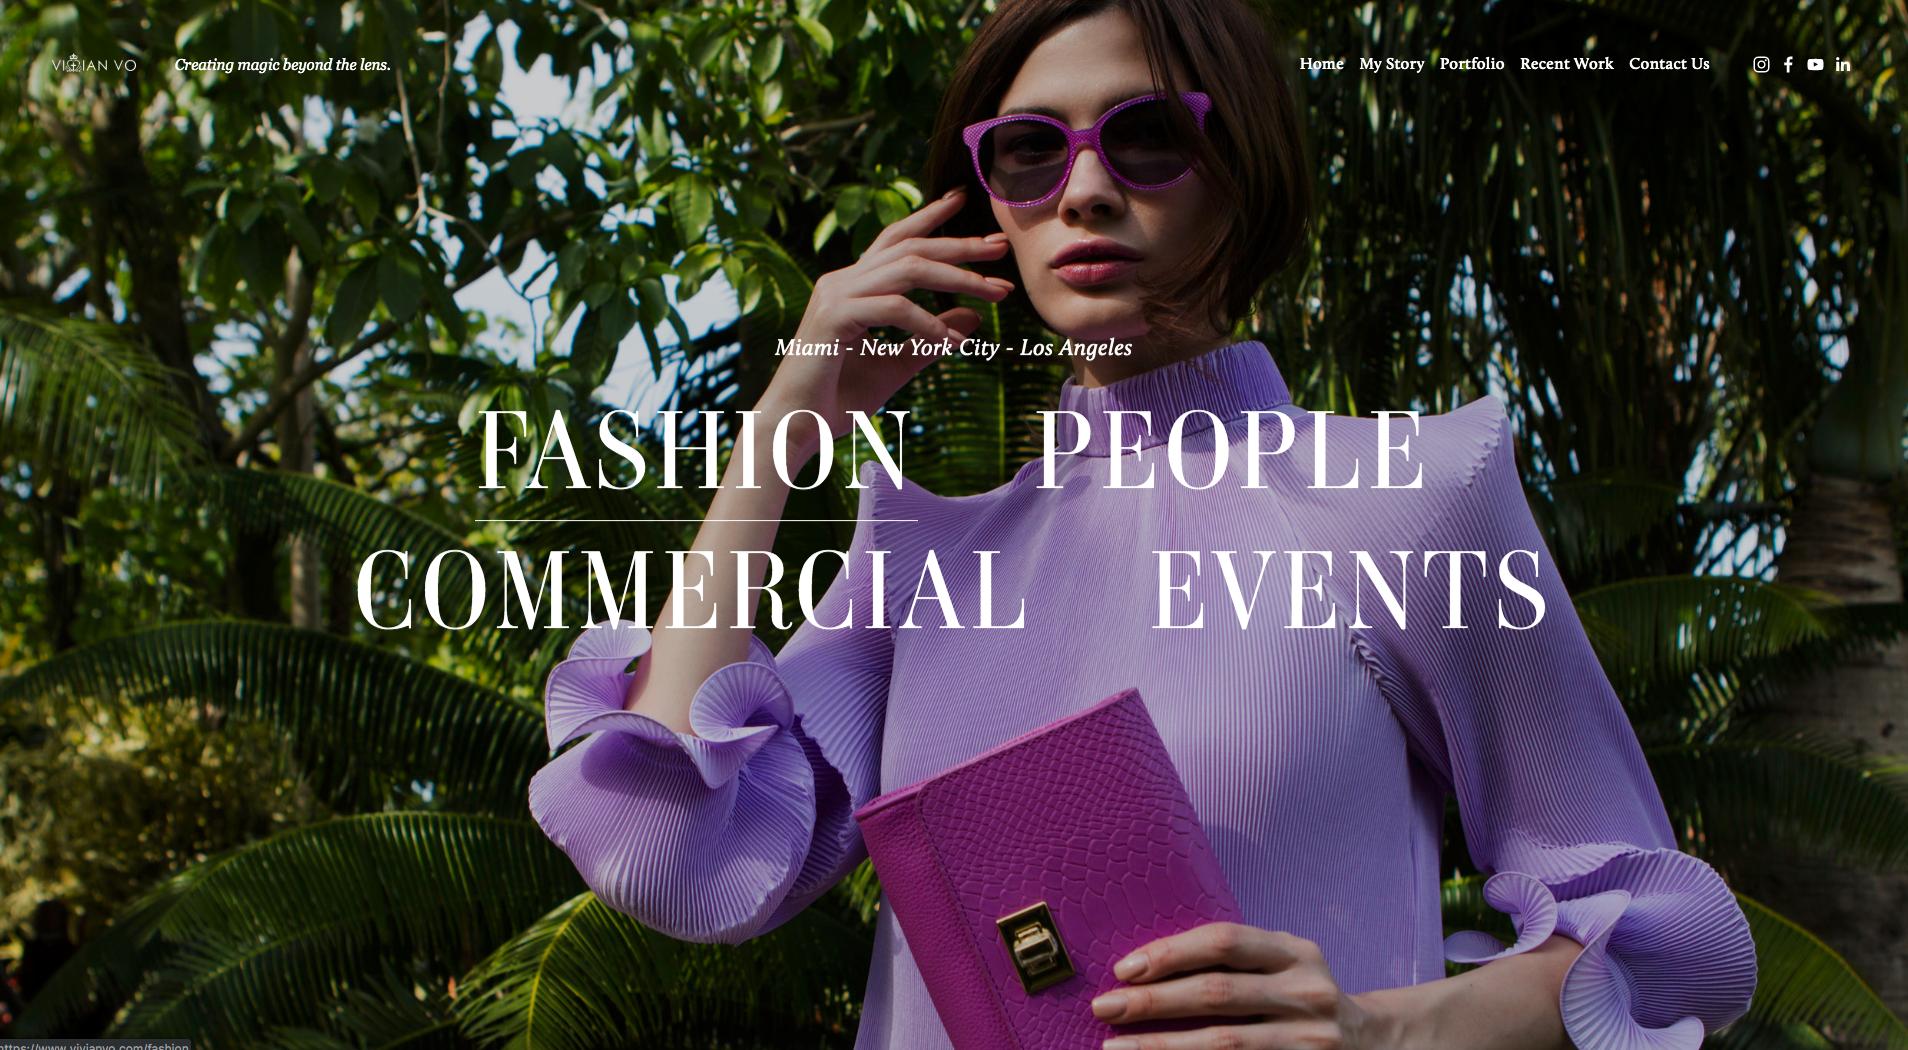 Vivian Vo - Fashion Photography Website